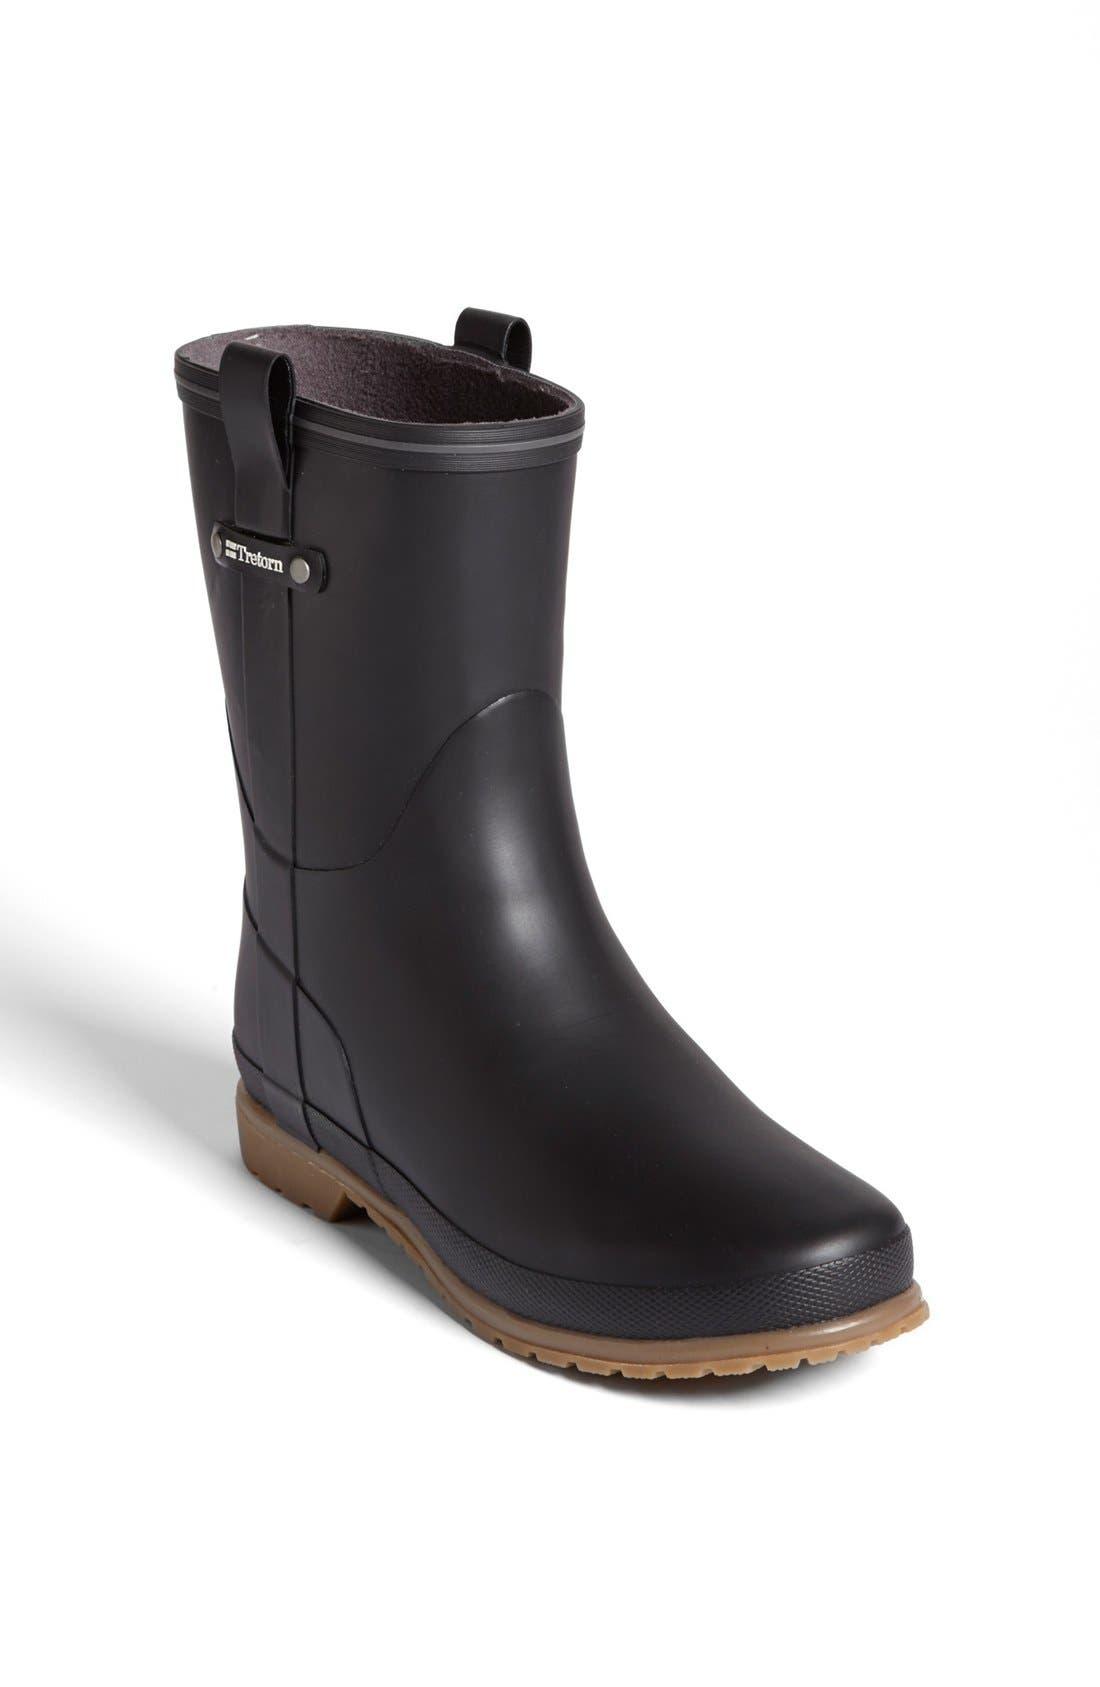 Alternate Image 1 Selected - Tretorn 'Elsa' Rain Boot (Women)